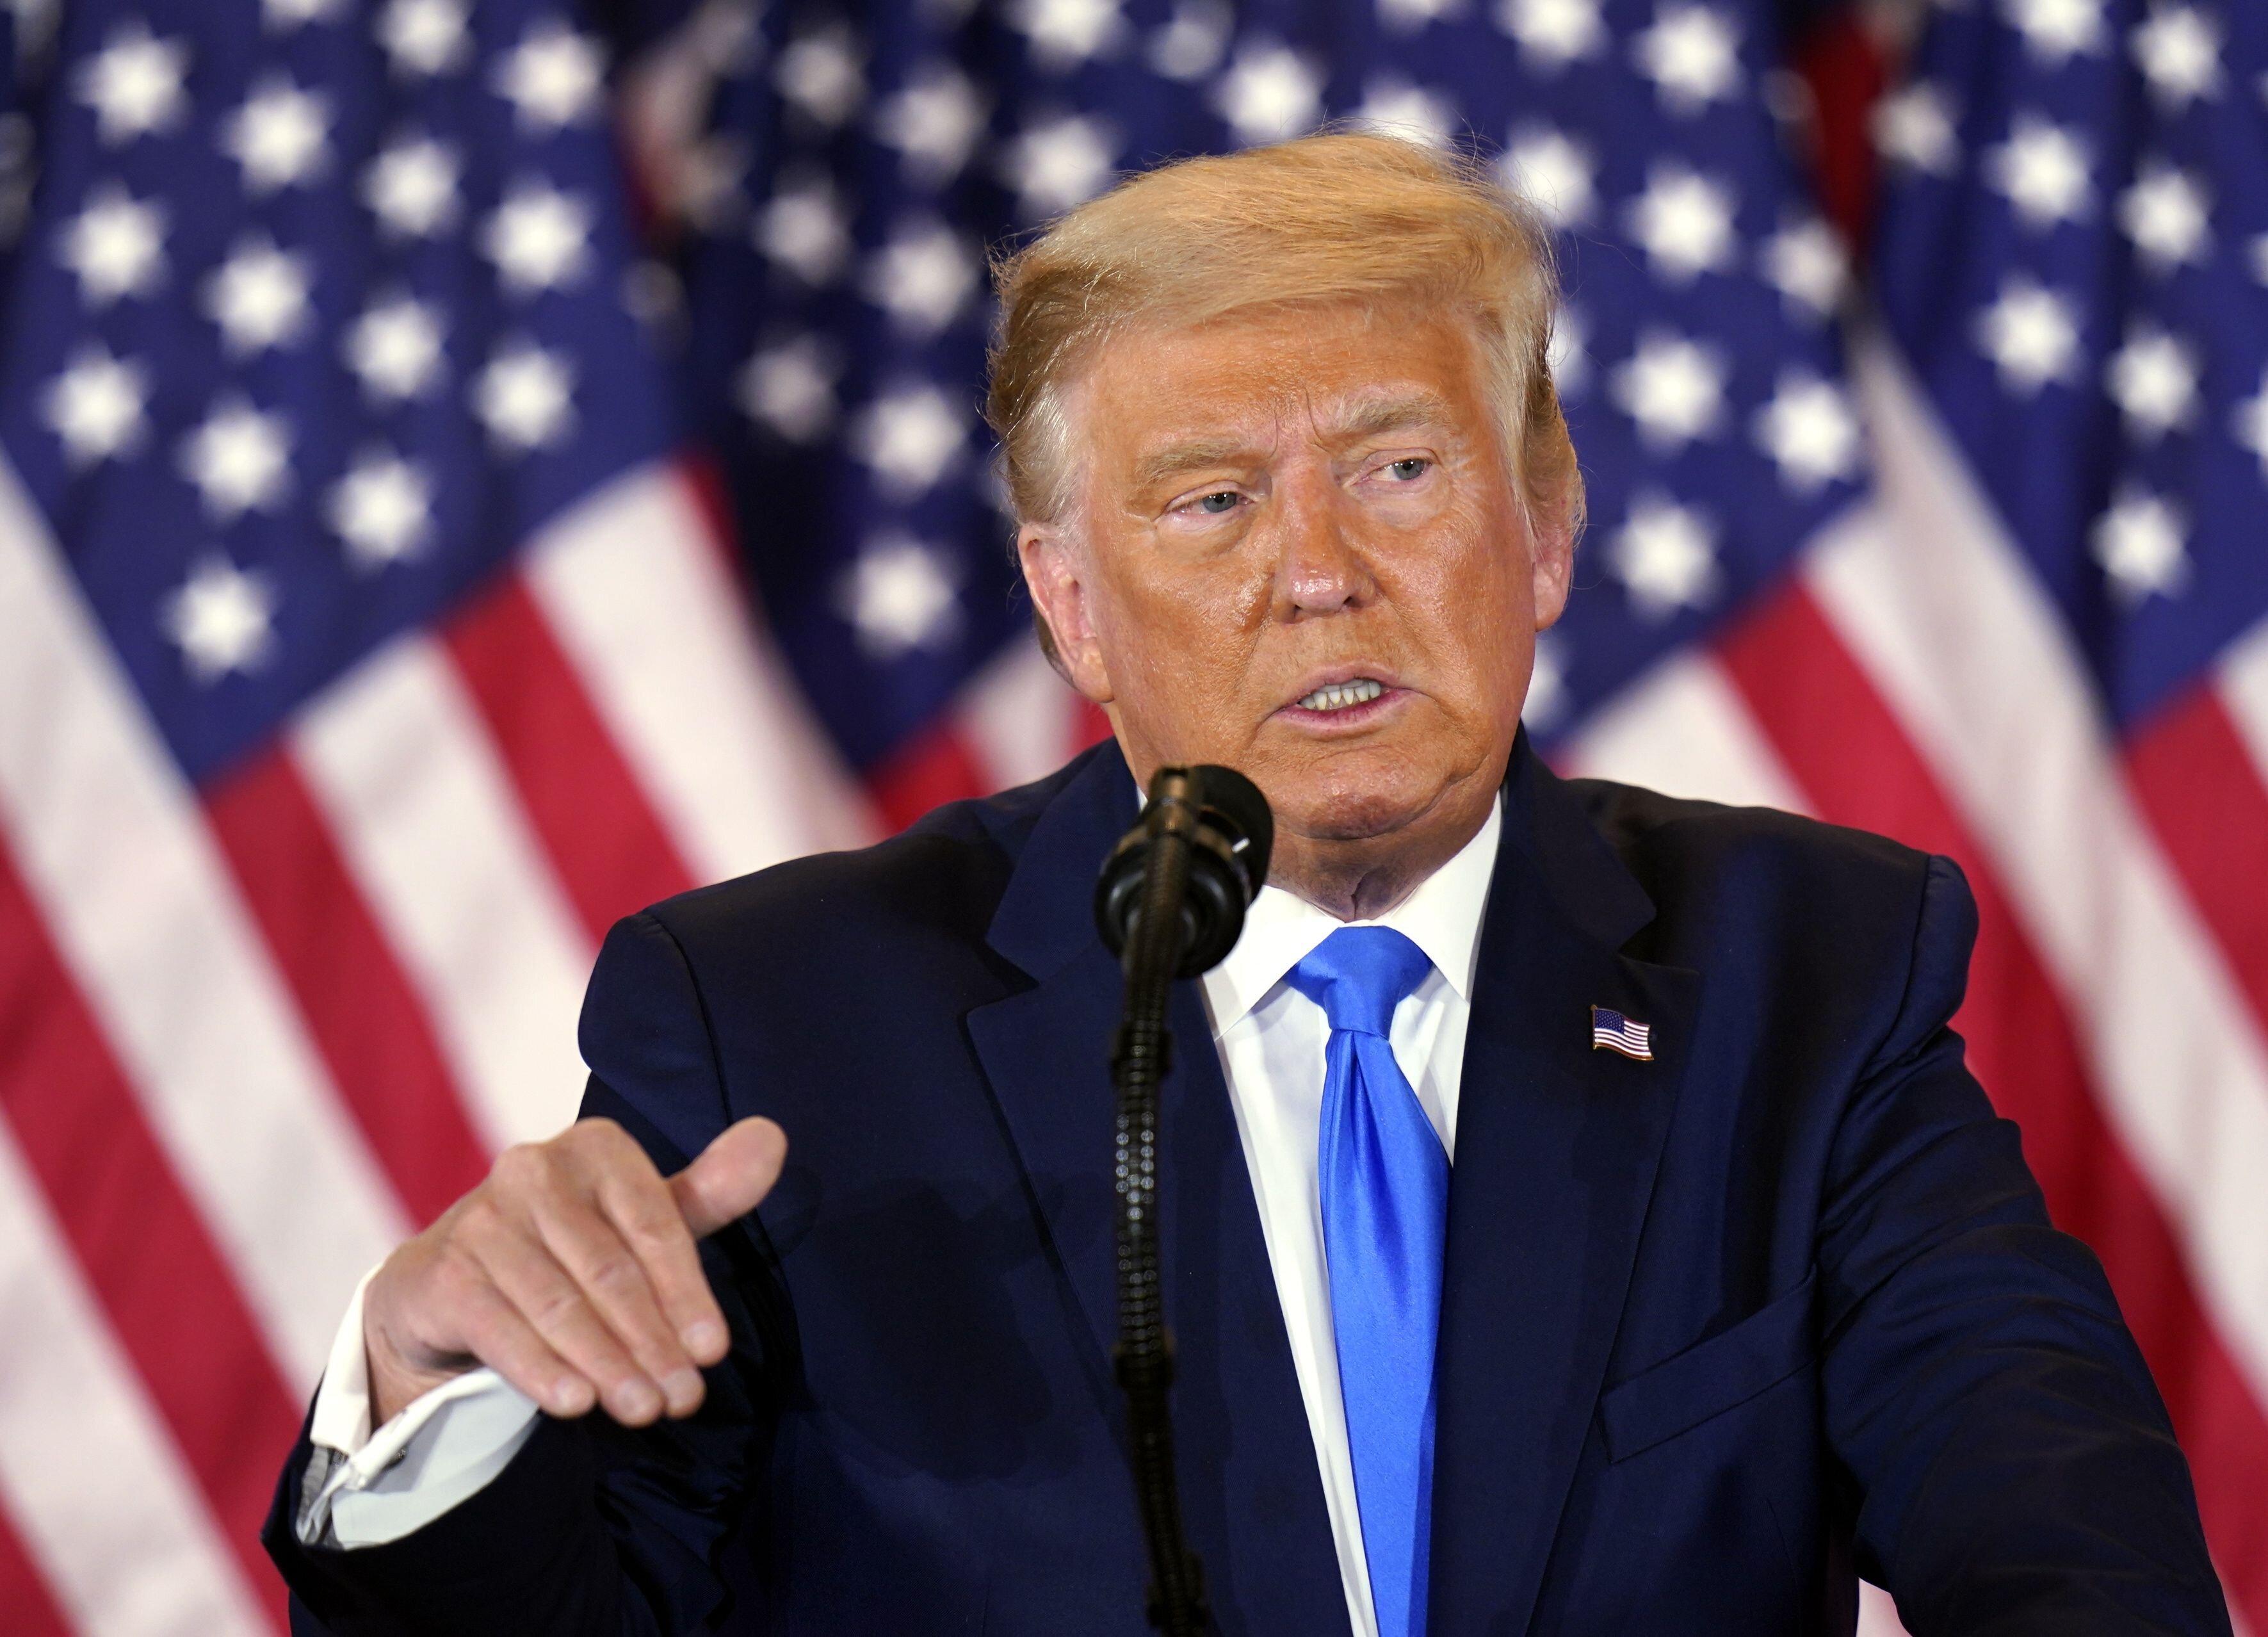 Donald Trump speaking election night.